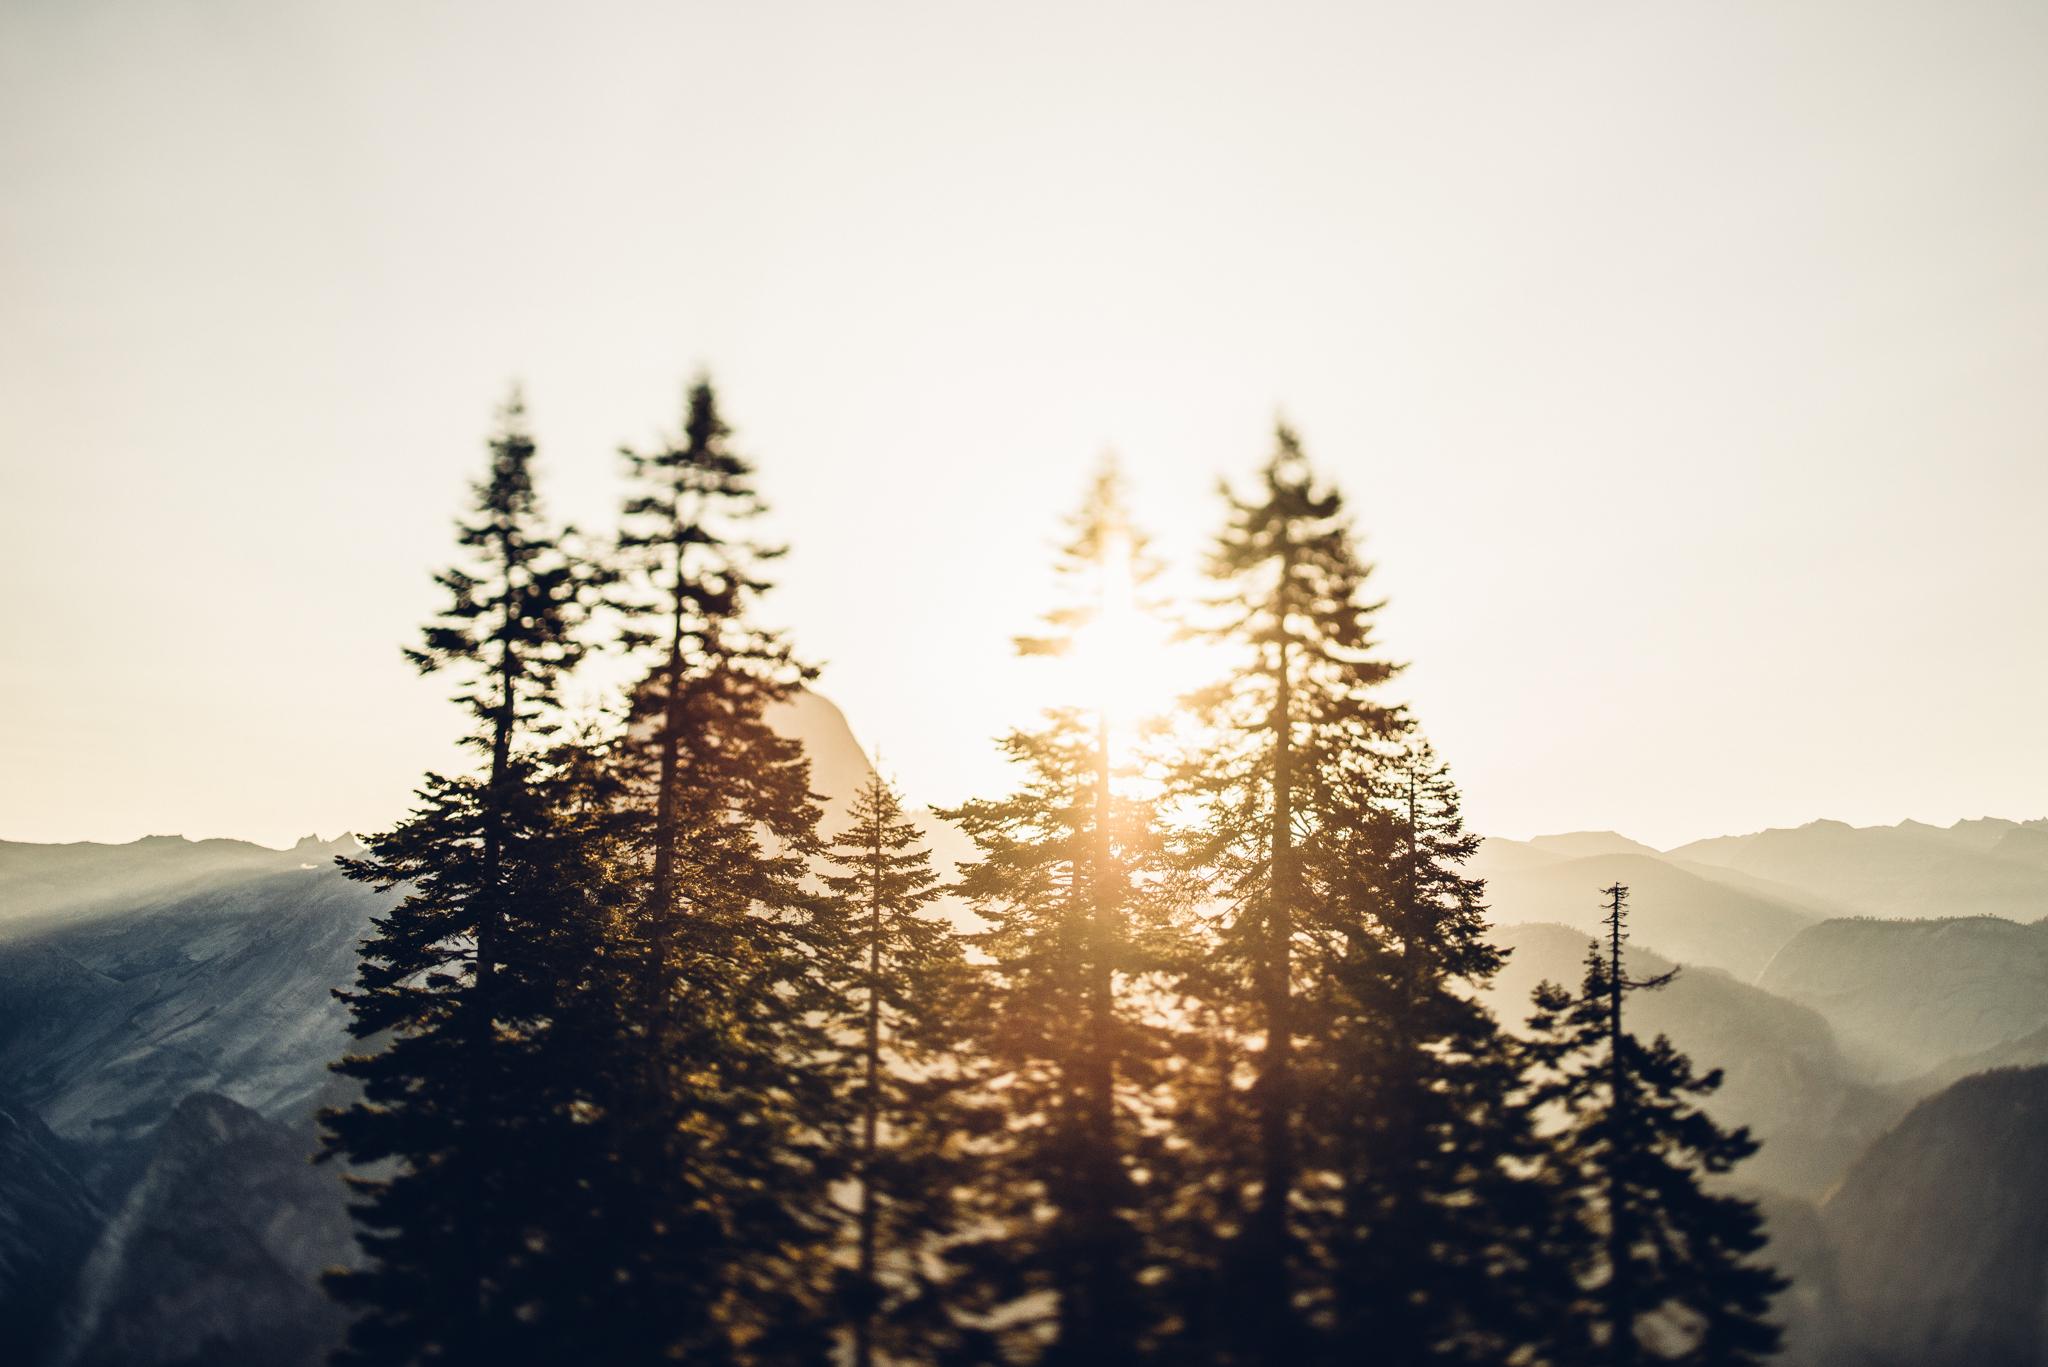 ©Isaiah & Taylor Photography - Los Angeles Destination Wedding Photographer - Yosemite National Park Hiking Adventure Engagement - Glacier Point Sunrise-017.jpg